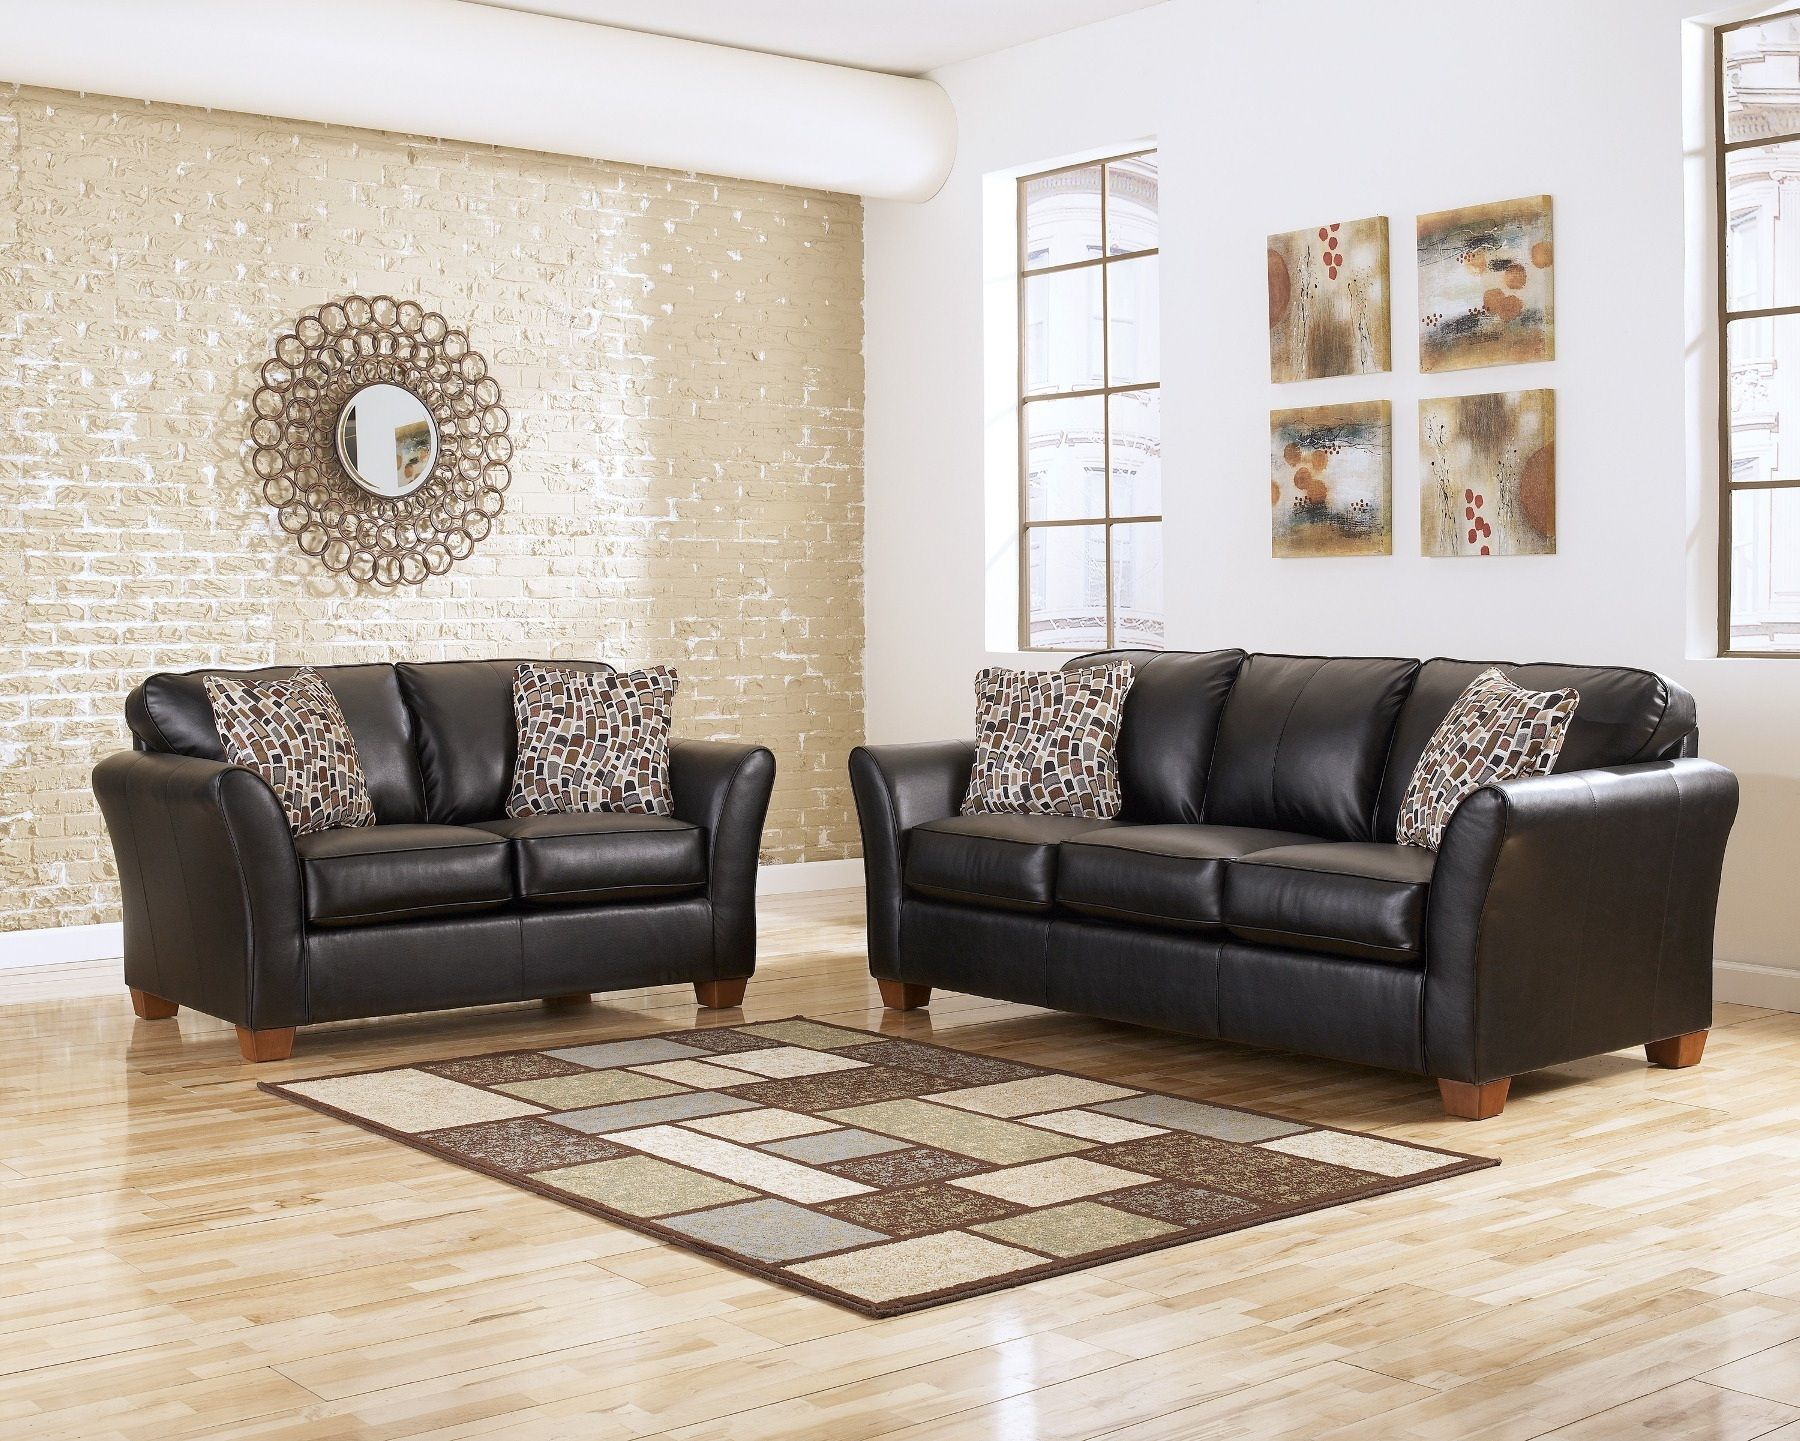 Stunning Big Lots Living Room Furniture Sofa design